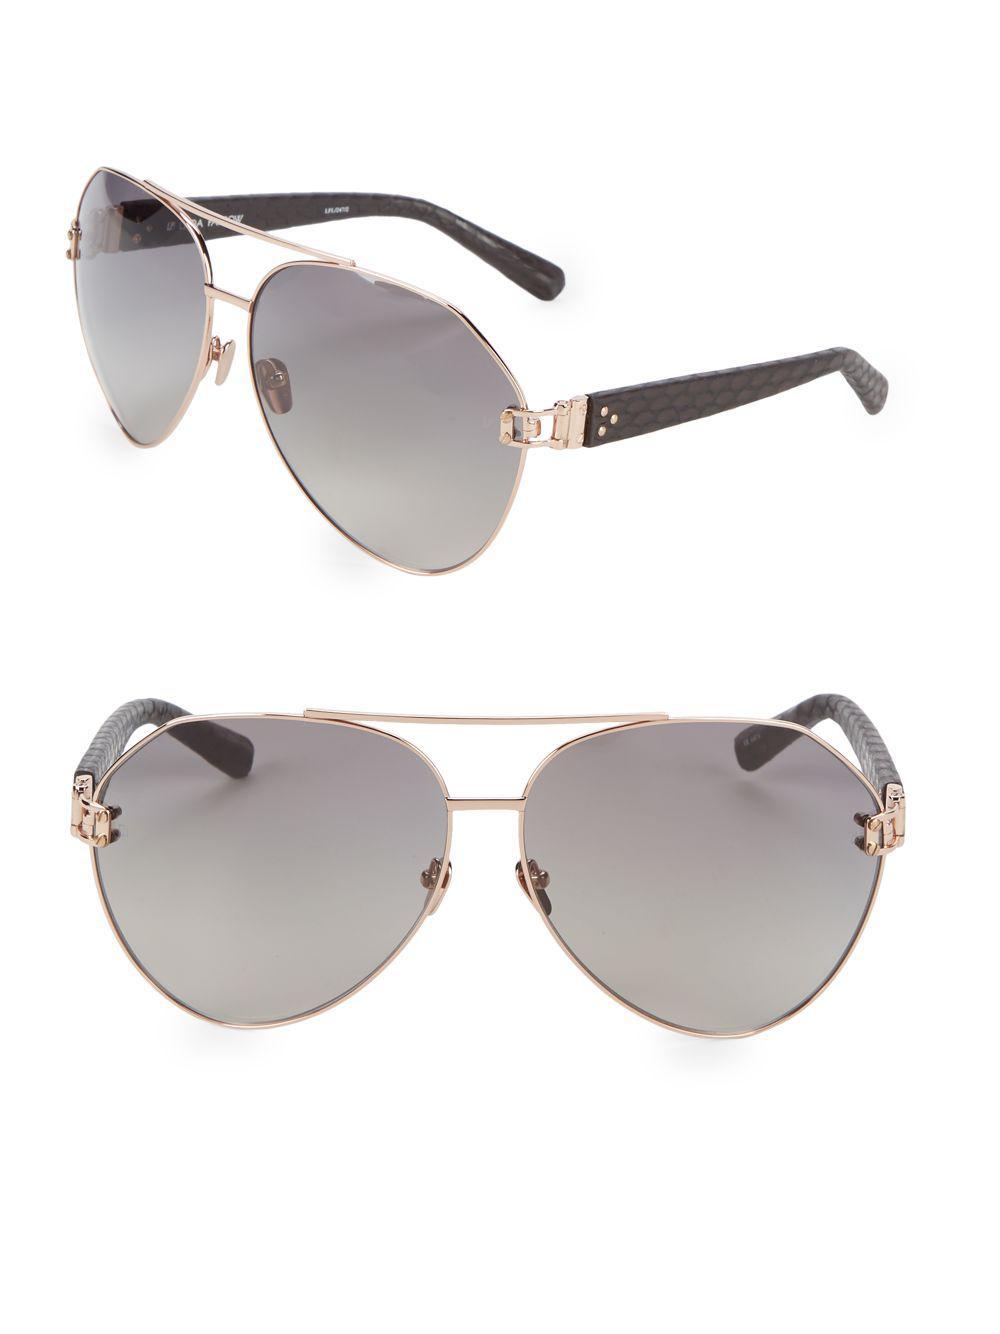 21240c925a4 Linda Farrow 60mm Snakeskin Arm Aviator Sunglasses in Metallic - Lyst